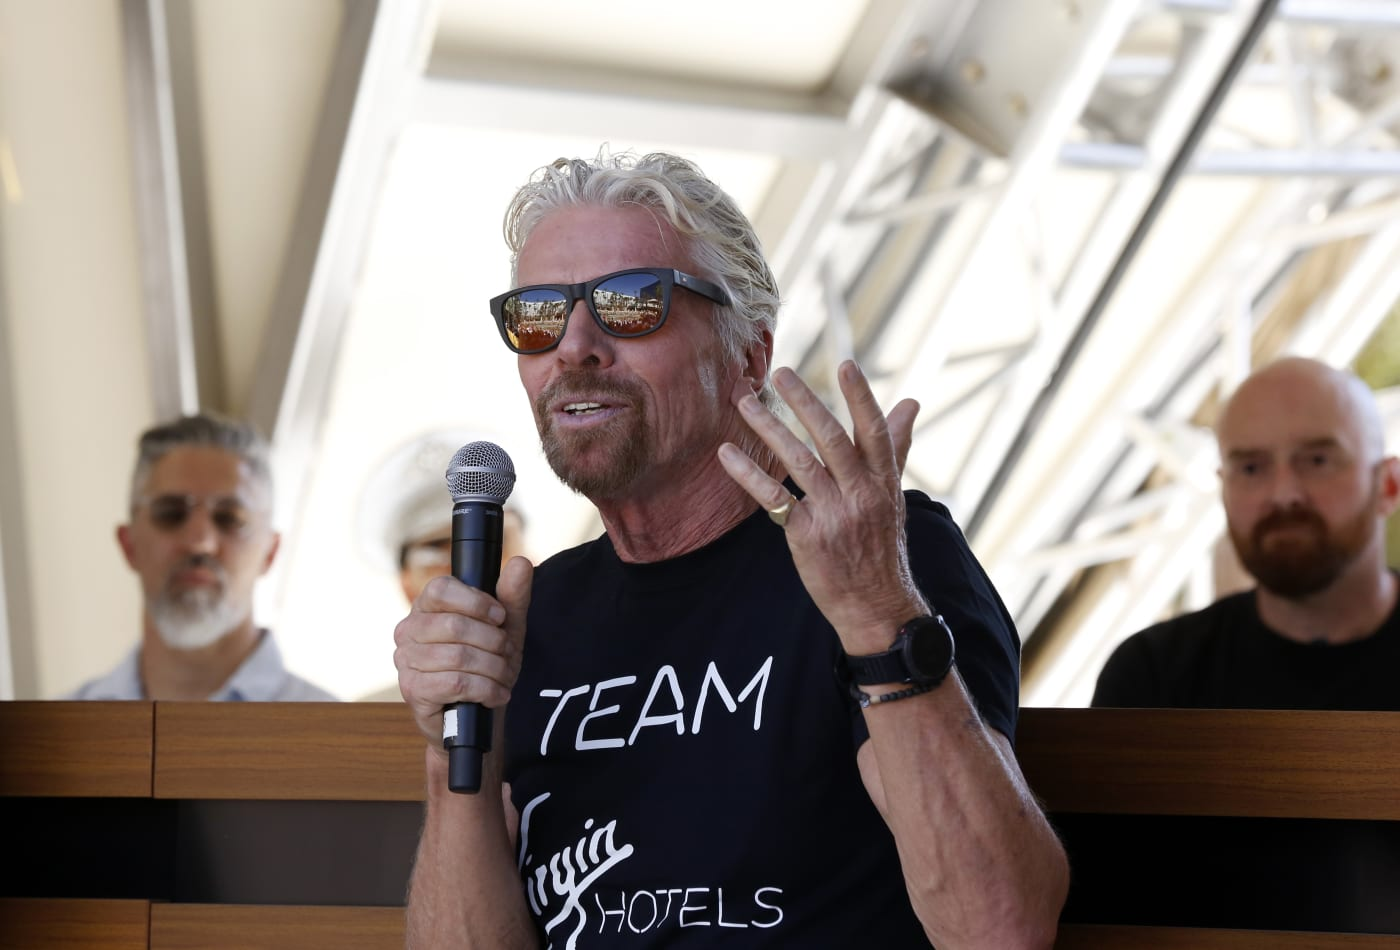 Billionaire Richard Branson has this advice for overcoming self-doubt